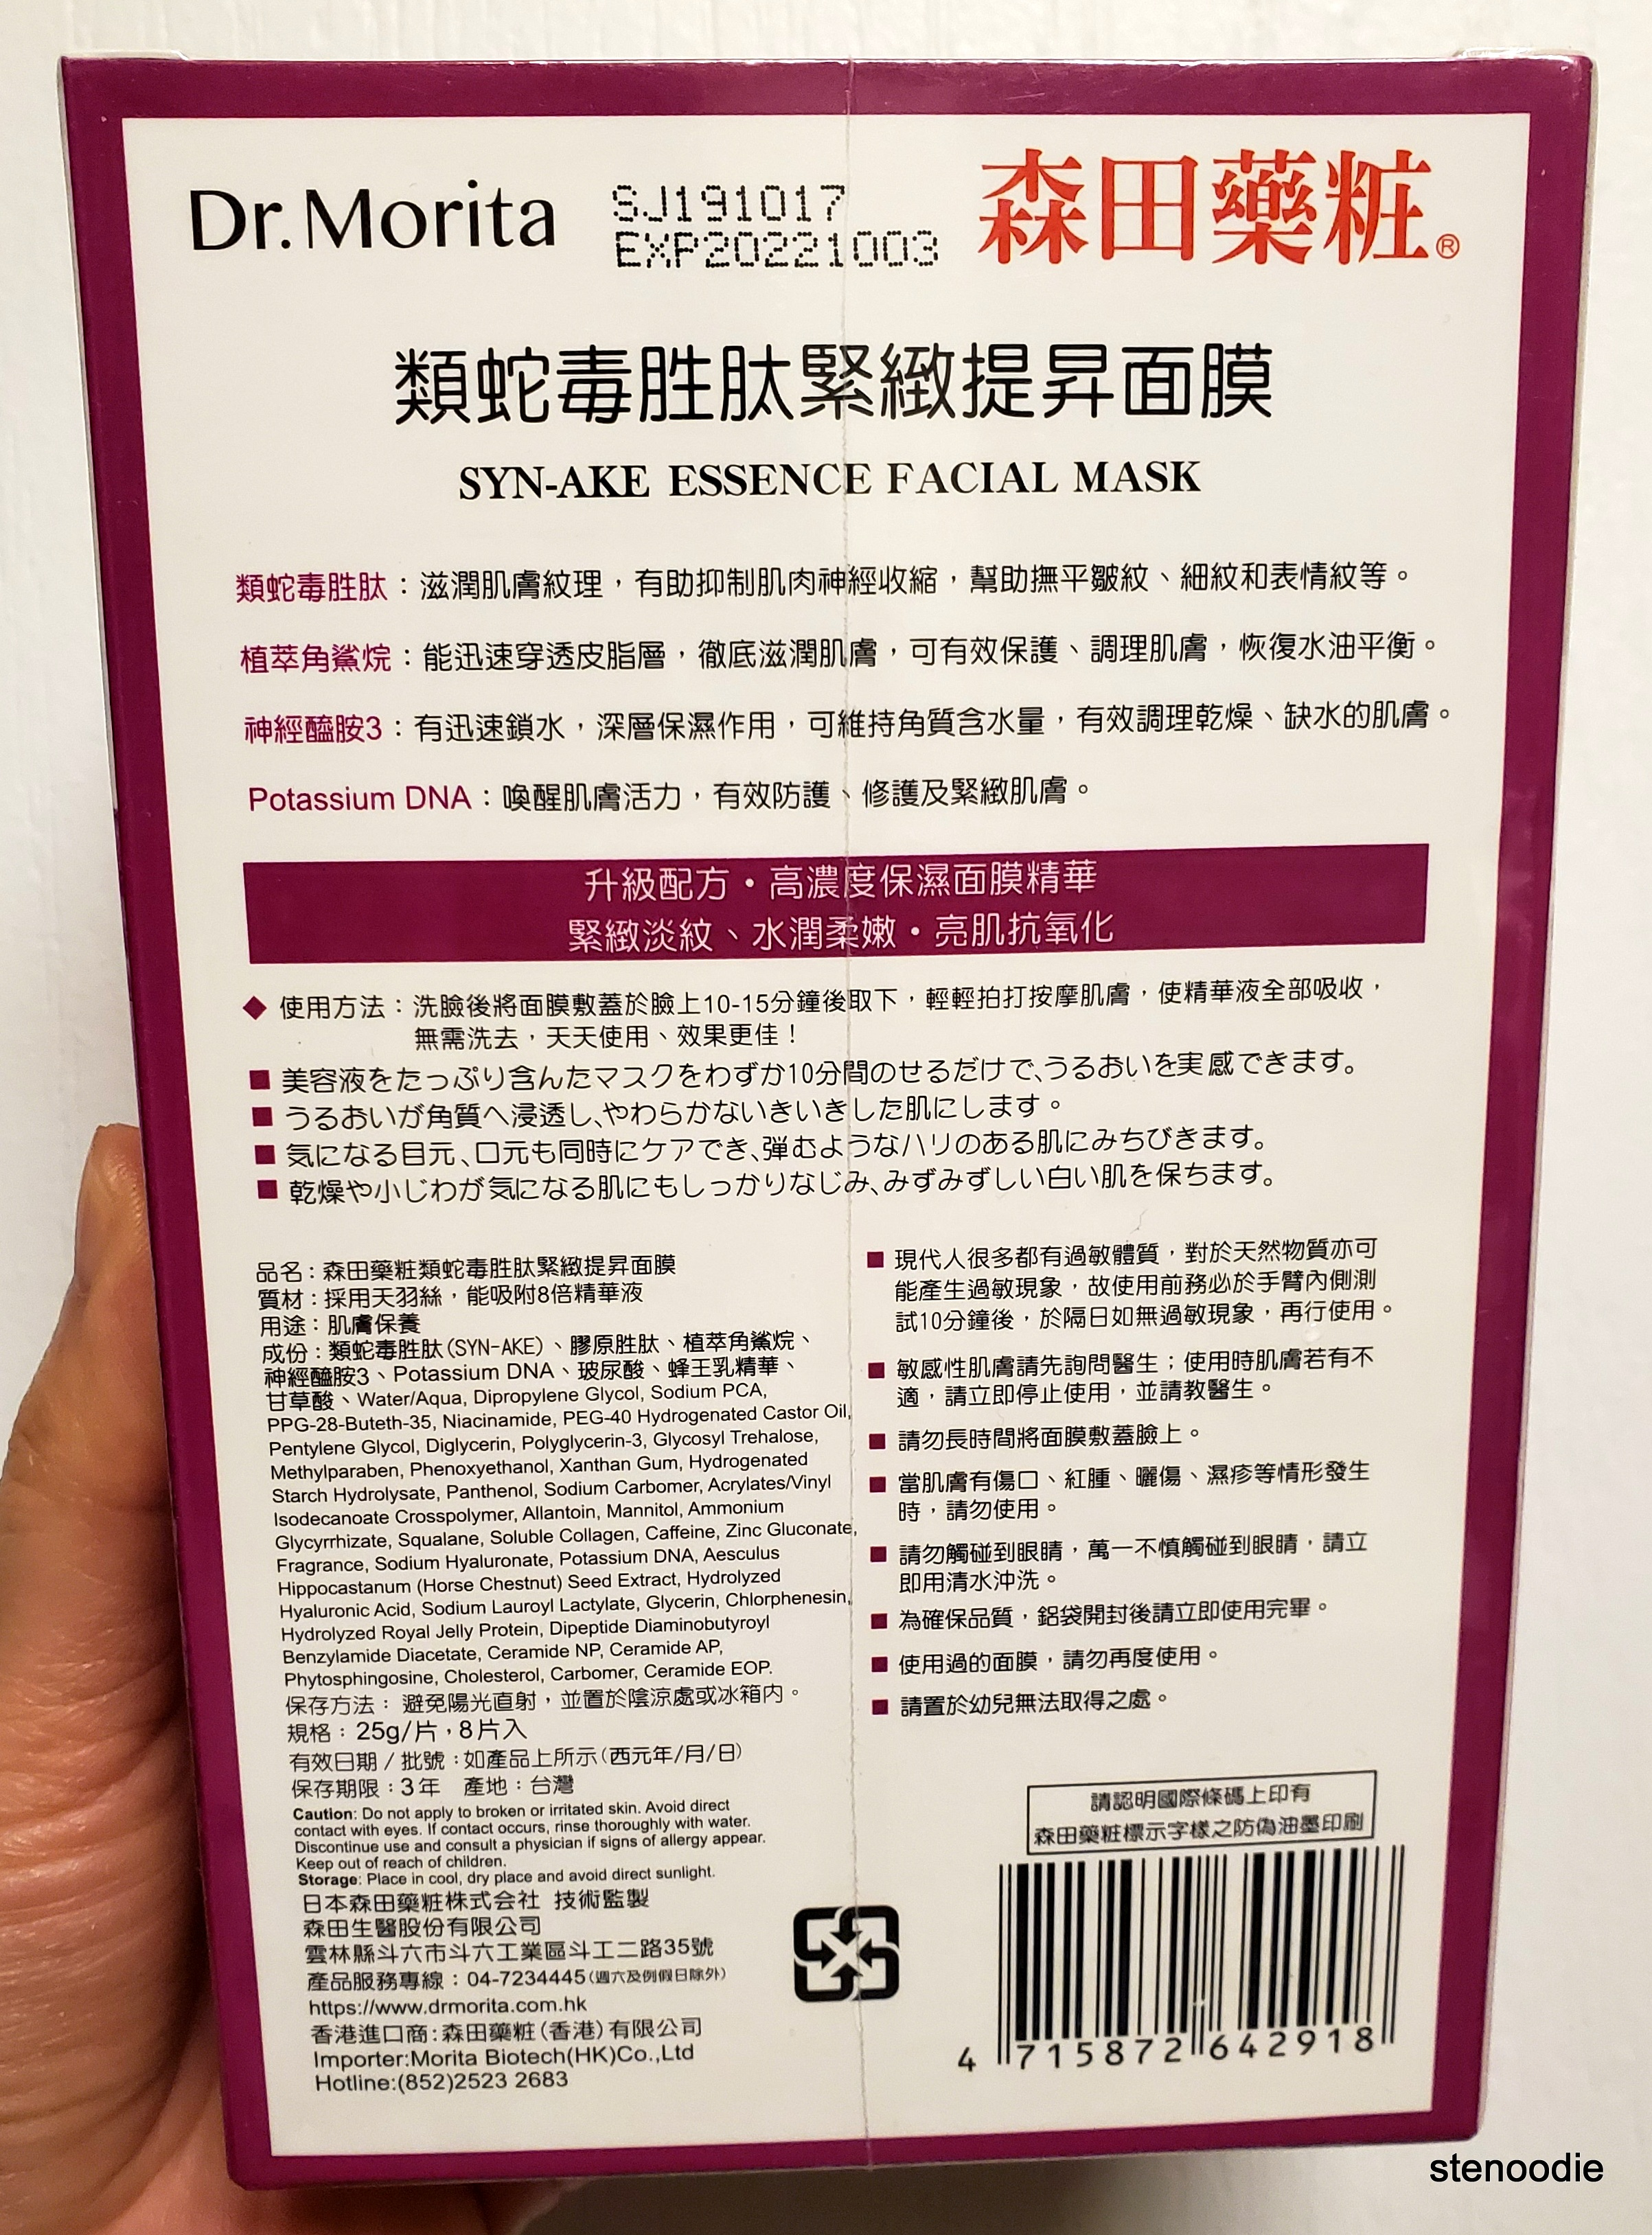 Dr. Morita Syn-ake Essence Facial Mask box